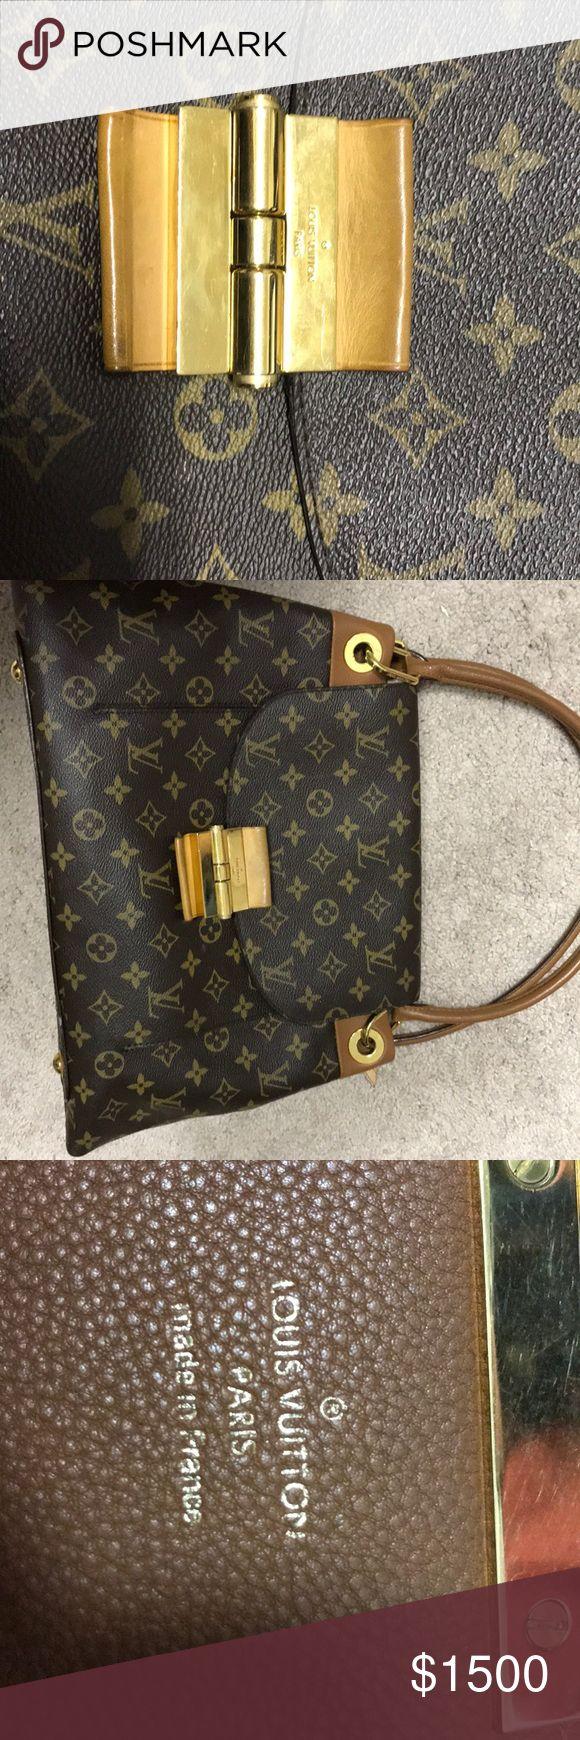 Louise Vuitton Very good condition bag original Louis Vuitton Bags Shoulder Bags